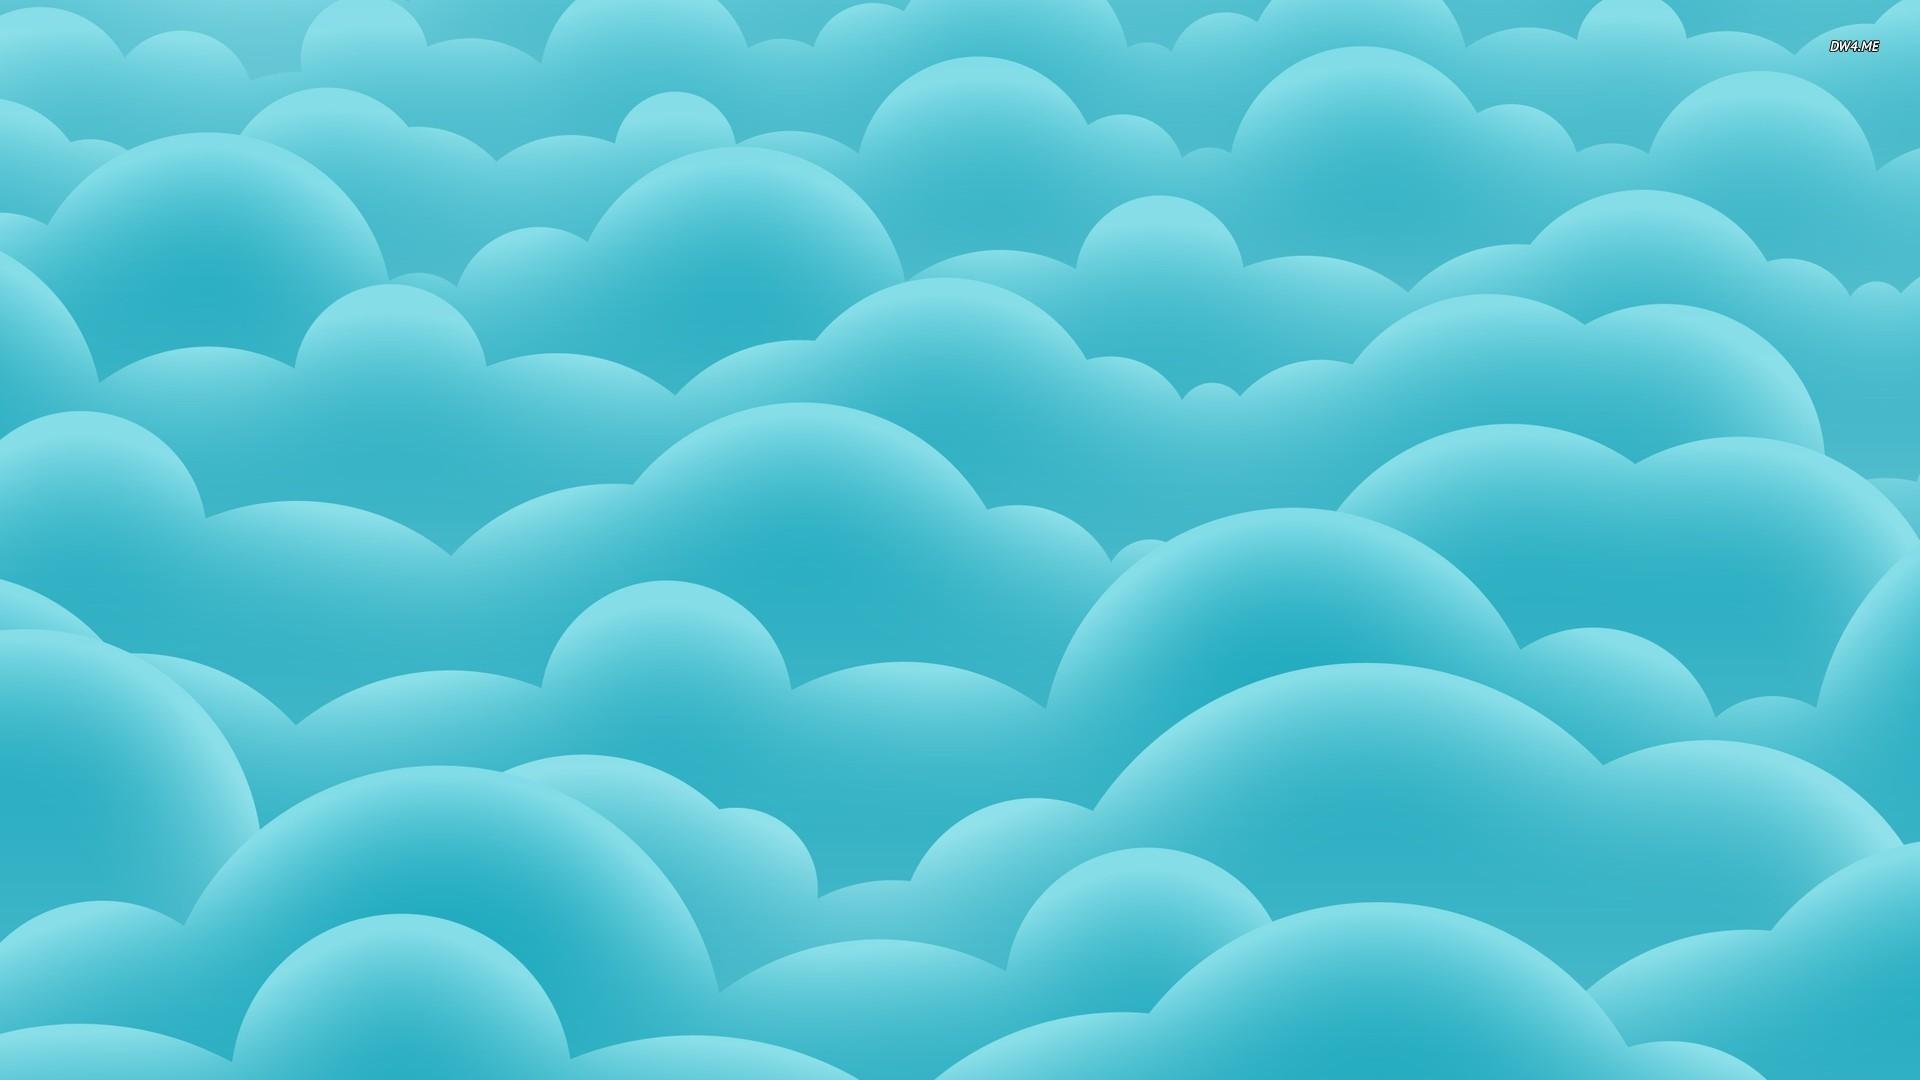 Digital Blue Cute Art Sky Clouds Hd Wallpaper Detail